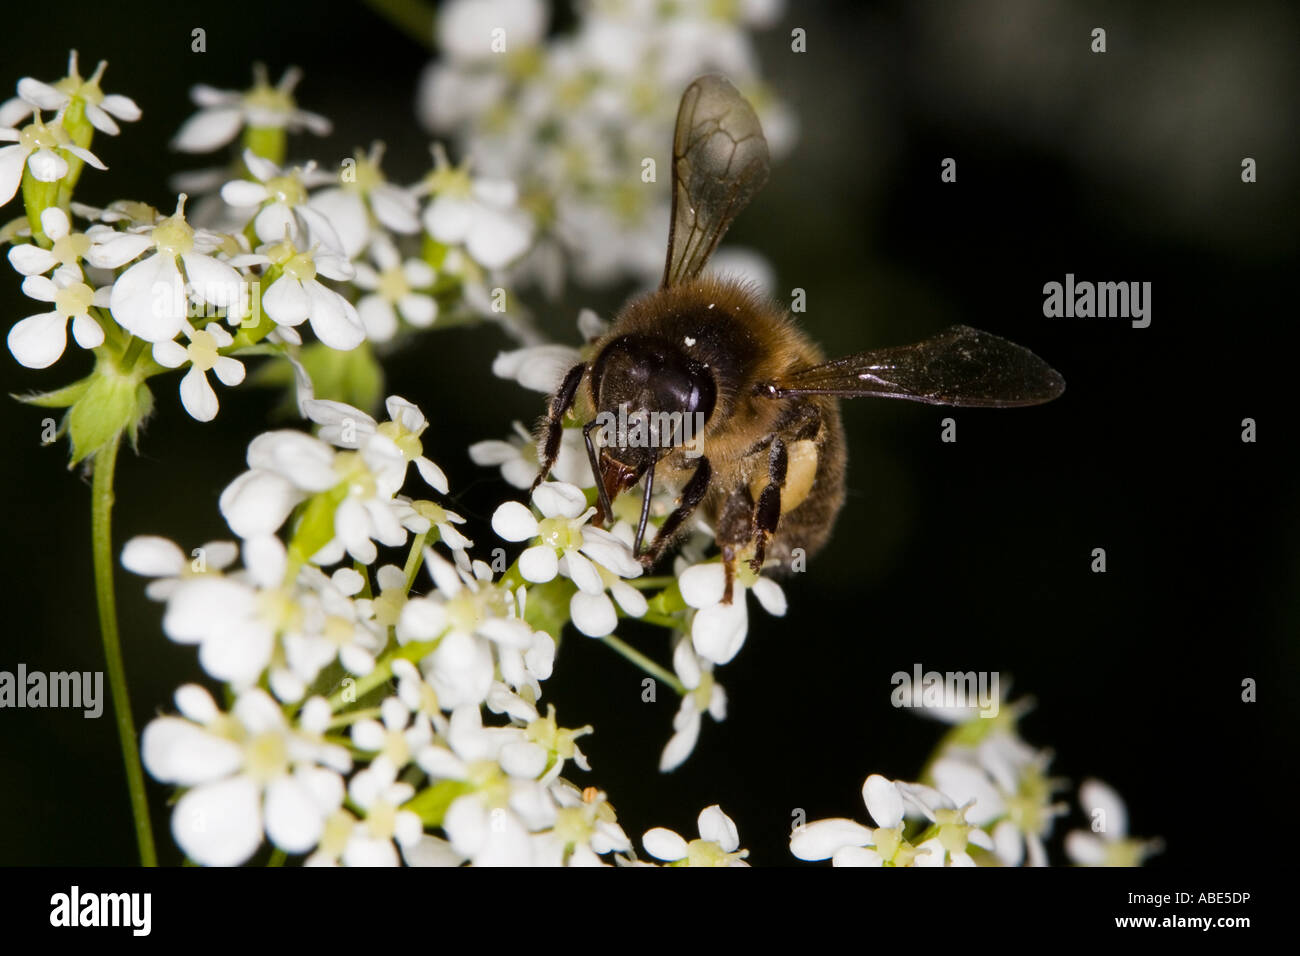 European Honeybee (Apis mellifera) feeding on umbellifera flower - Stock Image